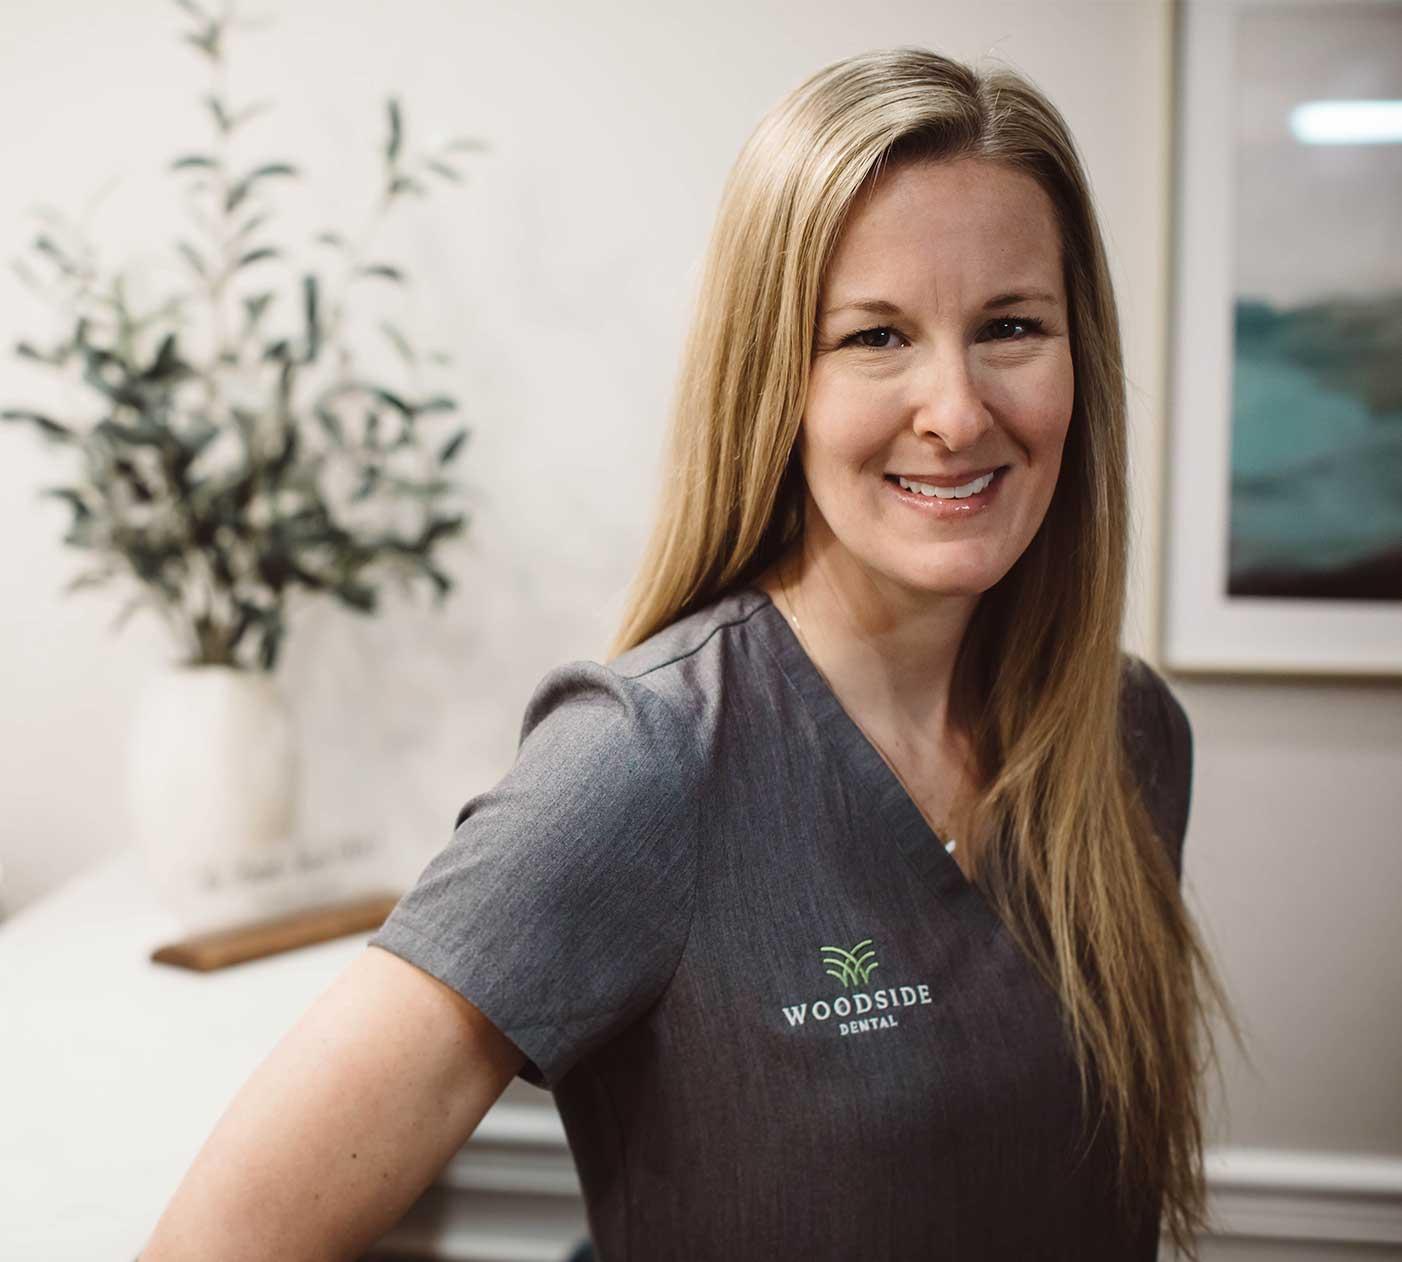 Photo of Stephanie Frank, a Woodside hygienist